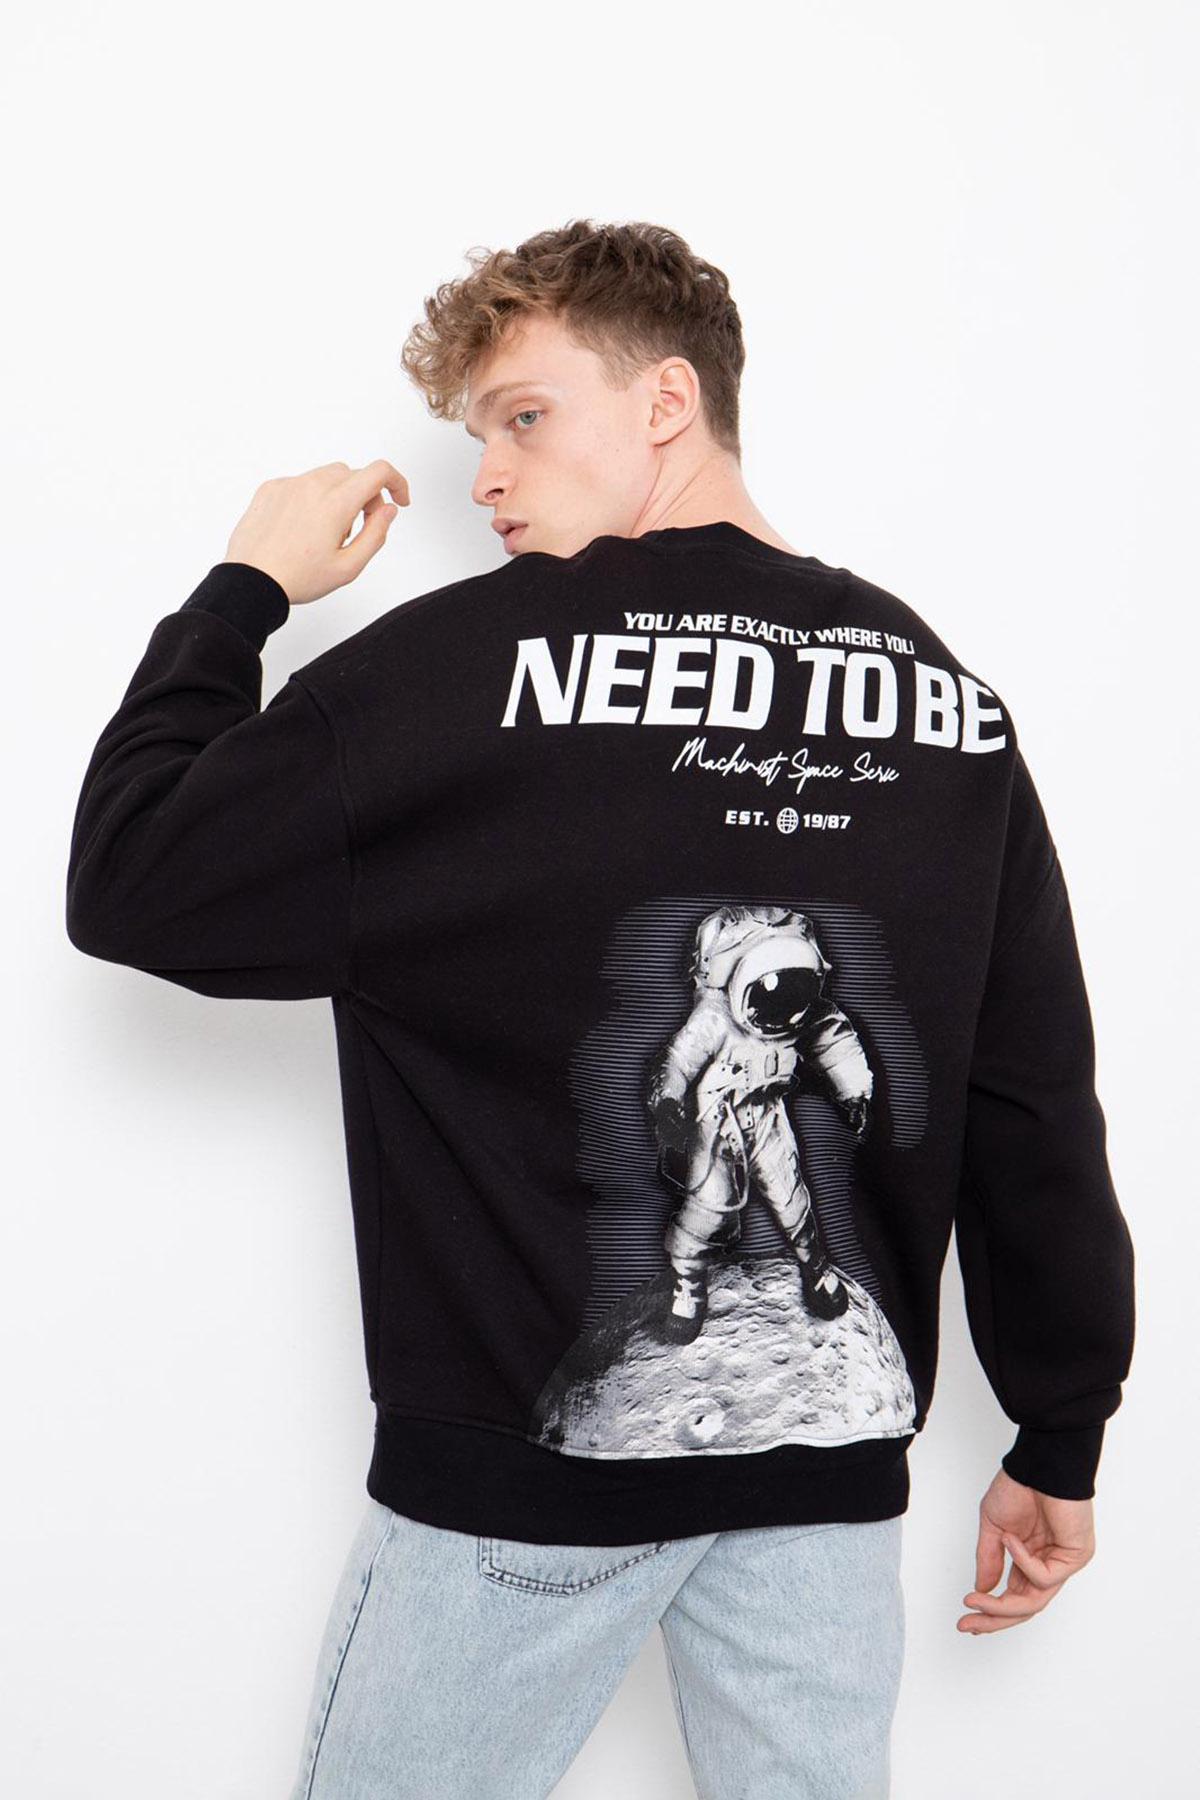 Siyah Baskılı Sweatshirt 2KXE8-45405-02